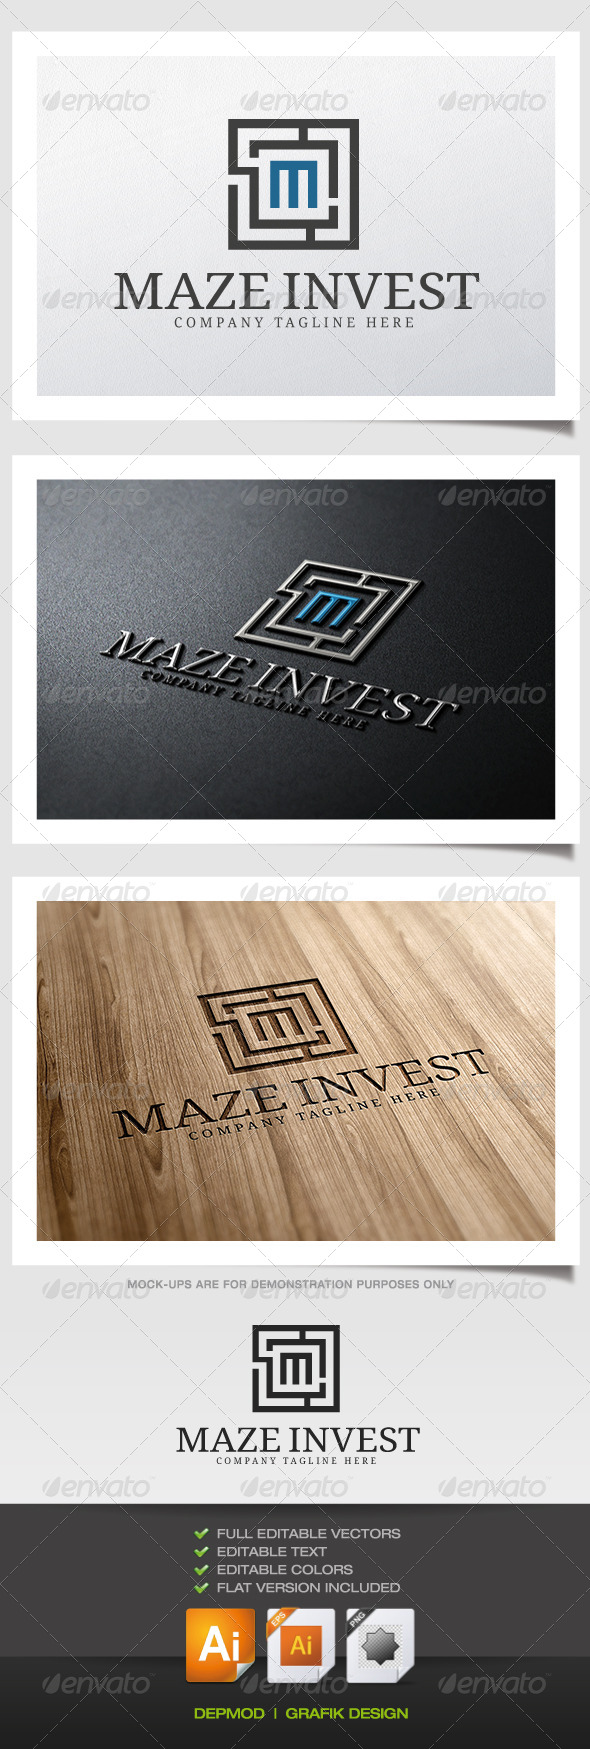 GraphicRiver Maze Invest Logo 5389123